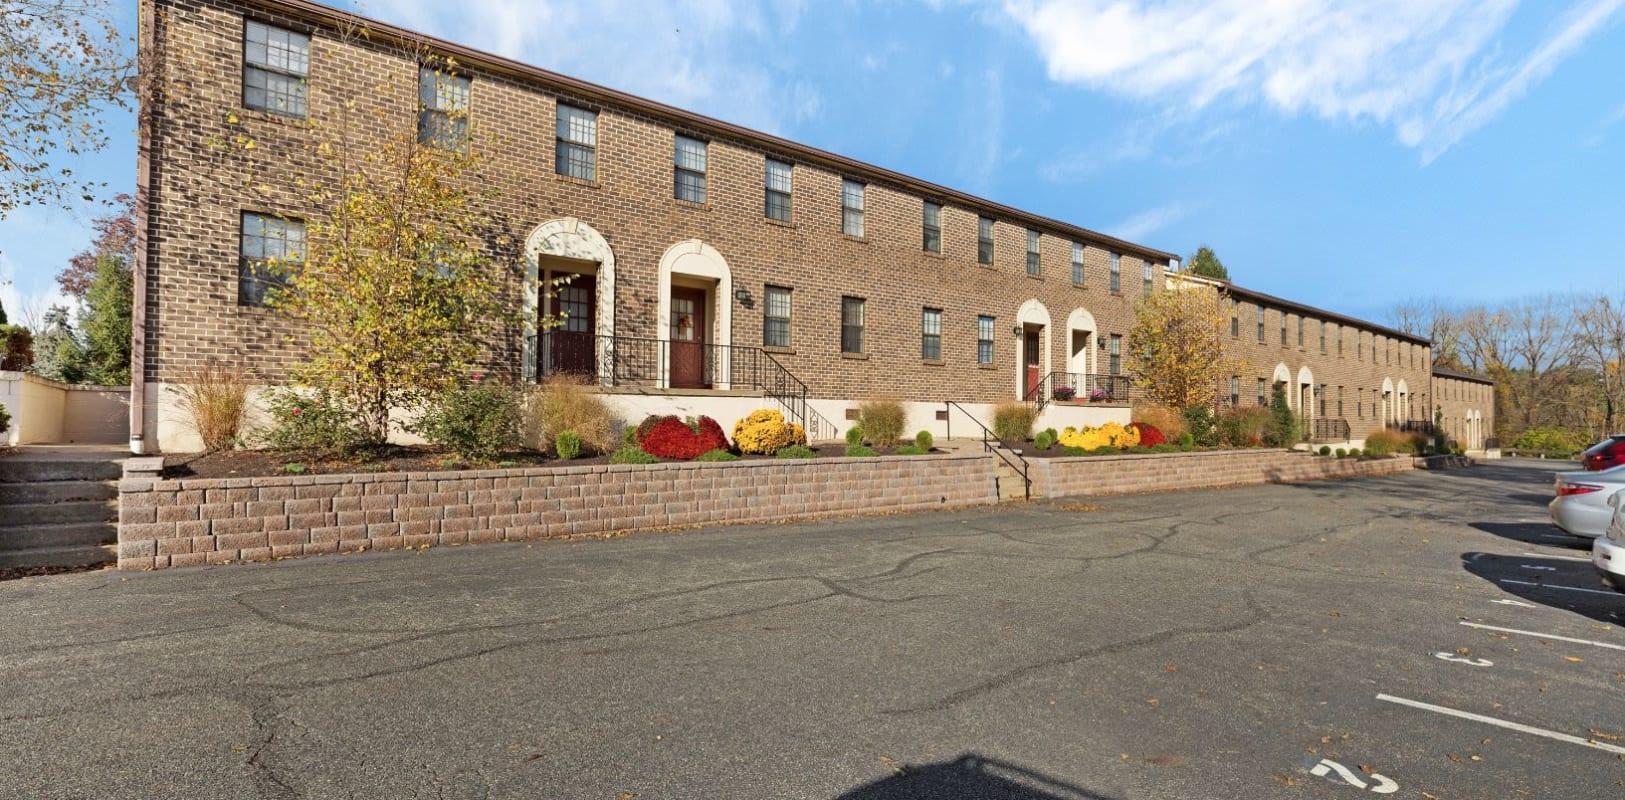 Exterior of Bridle Path Apartments in Bethlehem, Pennsylvania